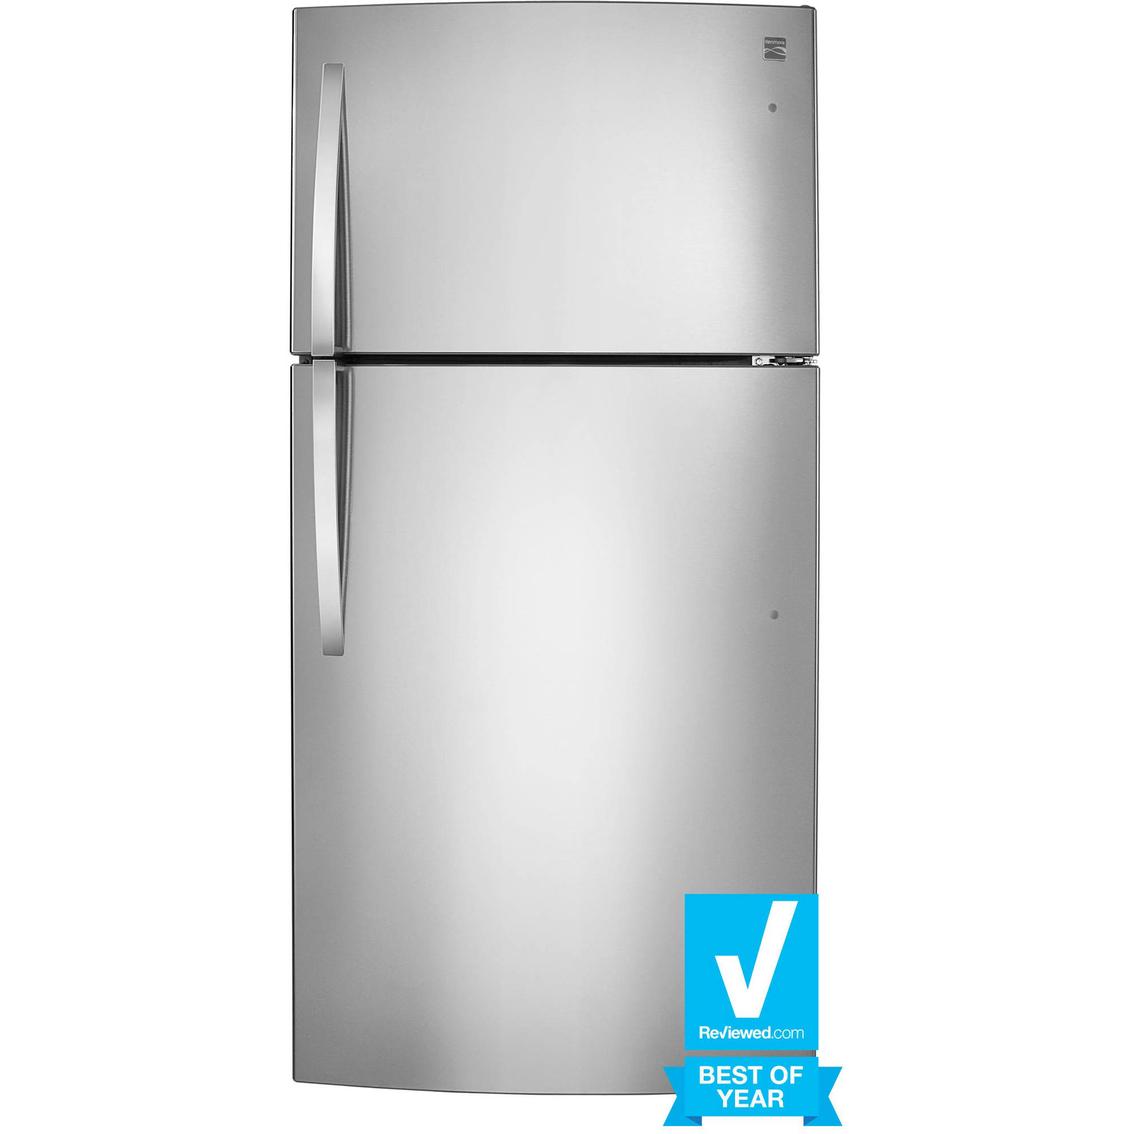 refrigerator with internal water dispenser 22.2 cu ft refrigerator with internal water dispenser kenmore 238 cu with